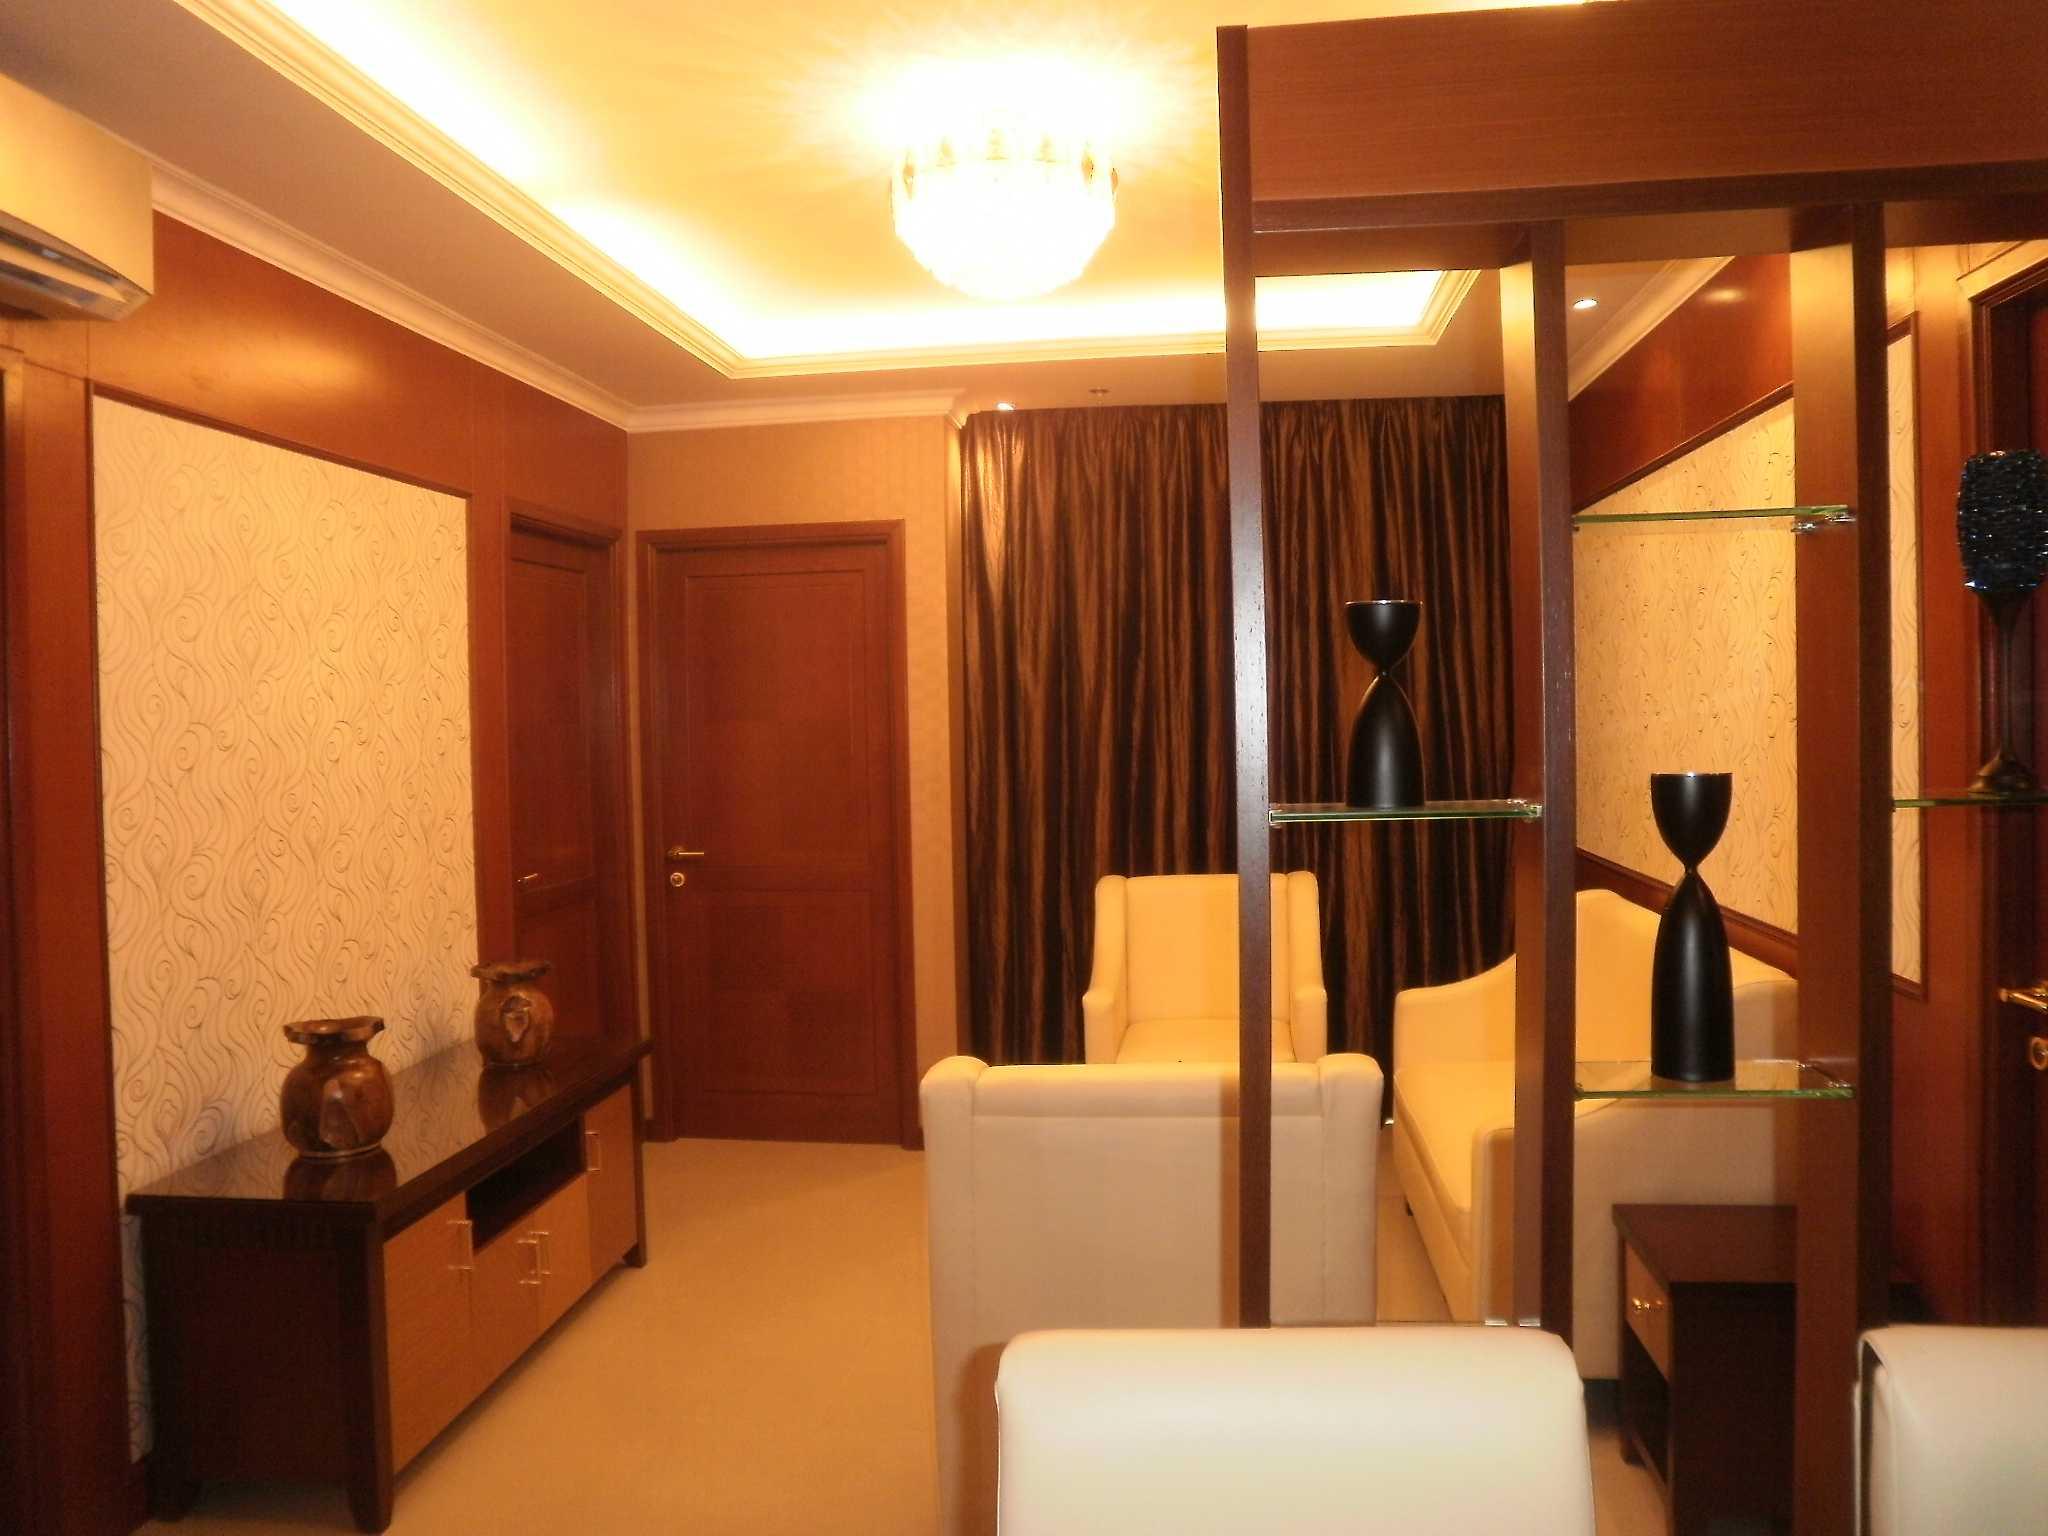 Bayu Prasetyo Lavande Residence Tebet, South Jakarta City, Jakarta, Indonesia Tebet, South Jakarta City, Jakarta, Indonesia P8010107 Asian  33691